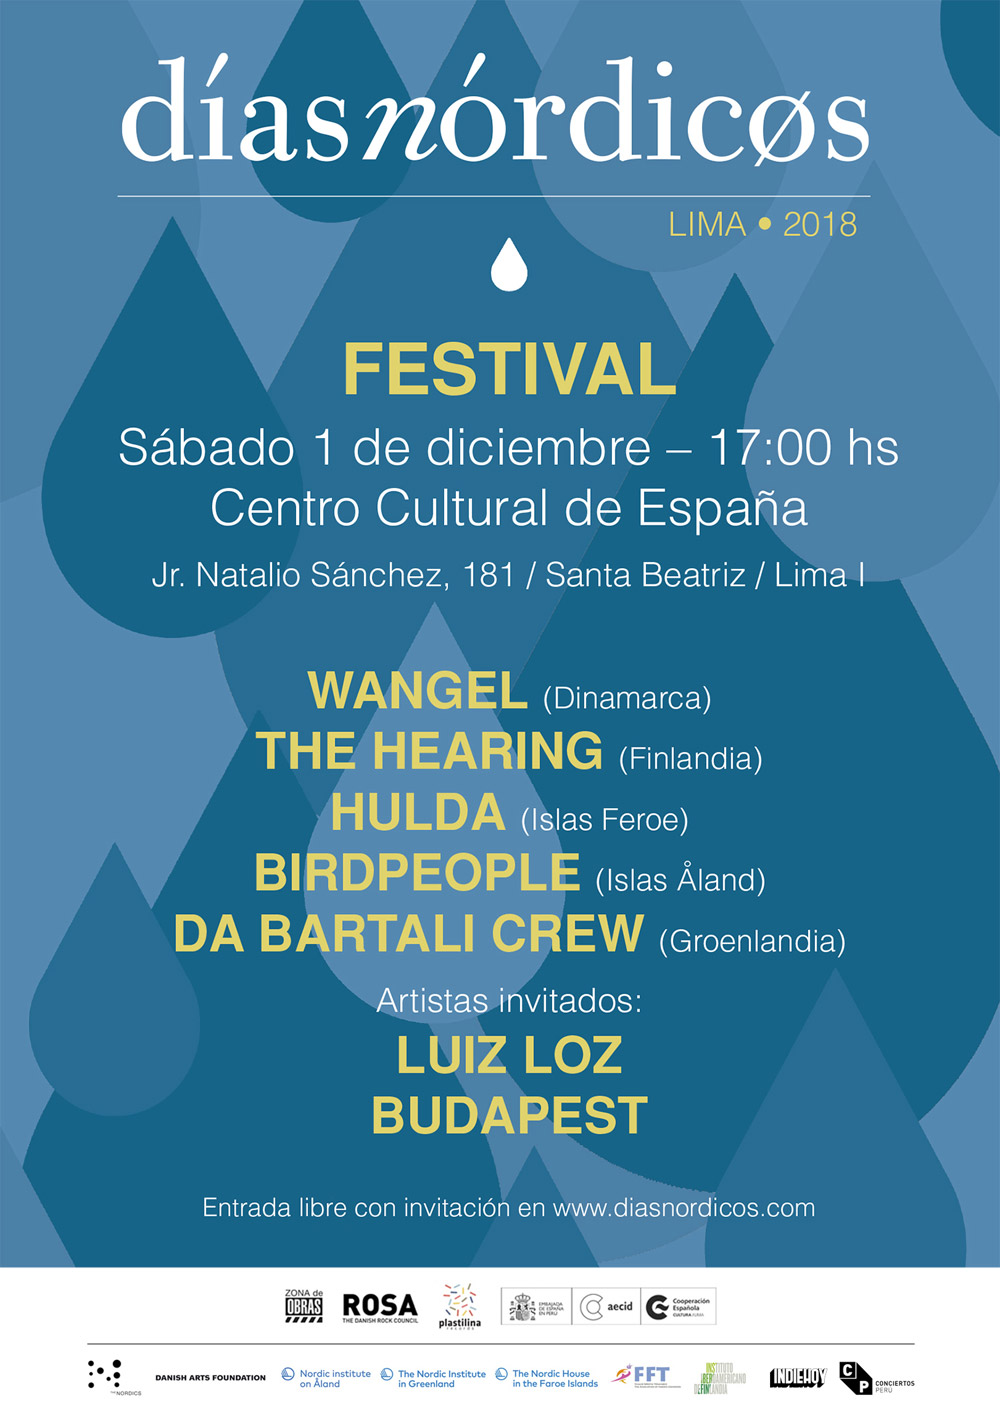 Días Nórdicos Perú 2018 - Cartel